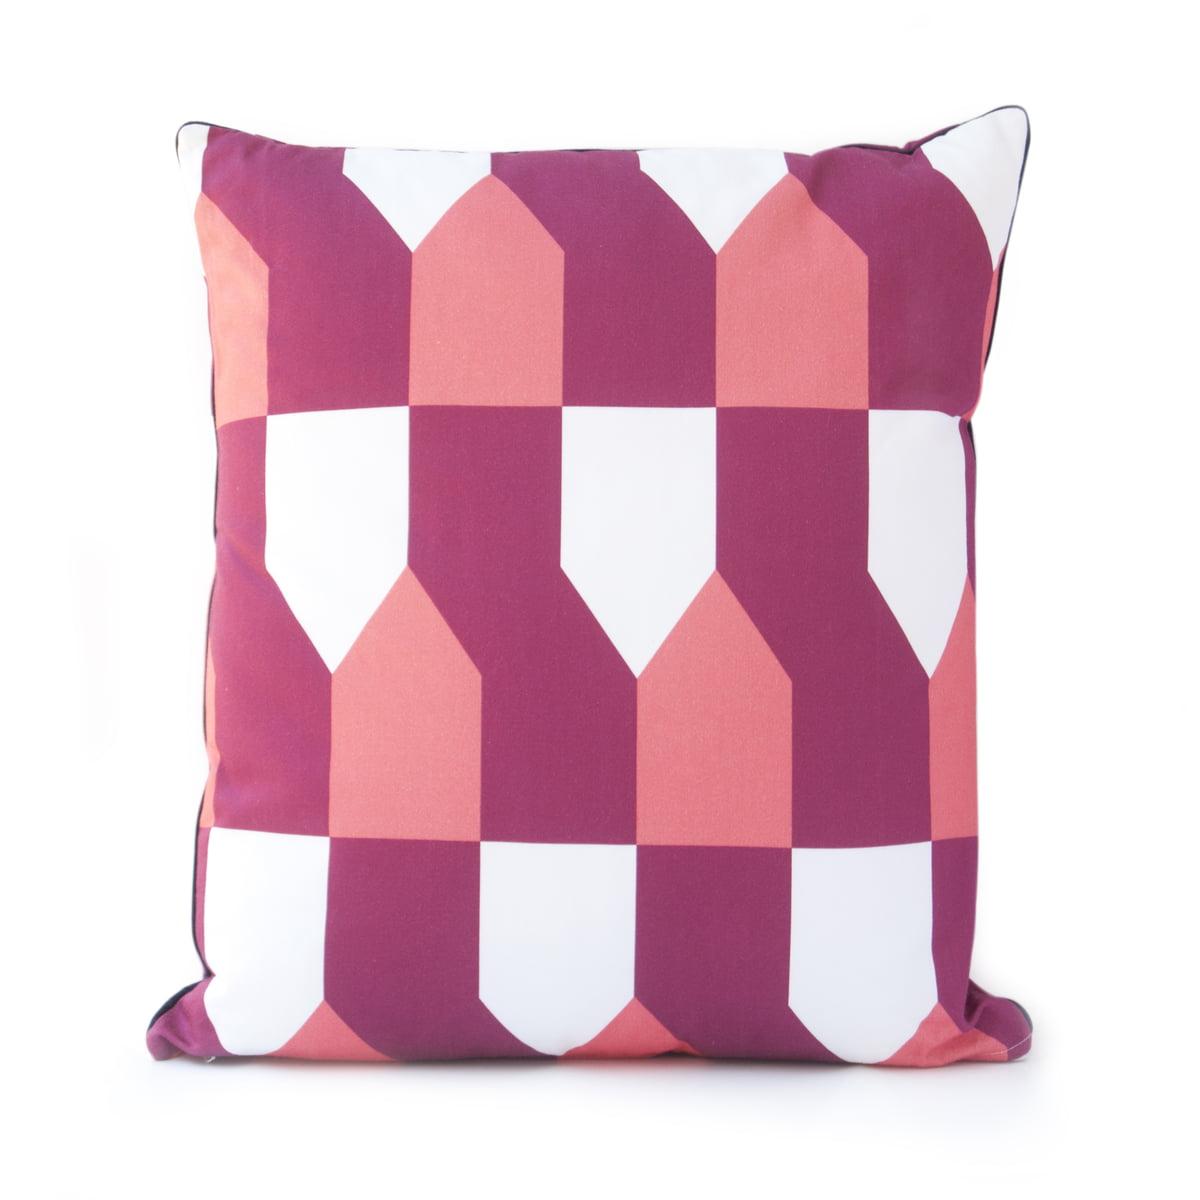 grand octave kissen 50 x 50 cm von hart. Black Bedroom Furniture Sets. Home Design Ideas